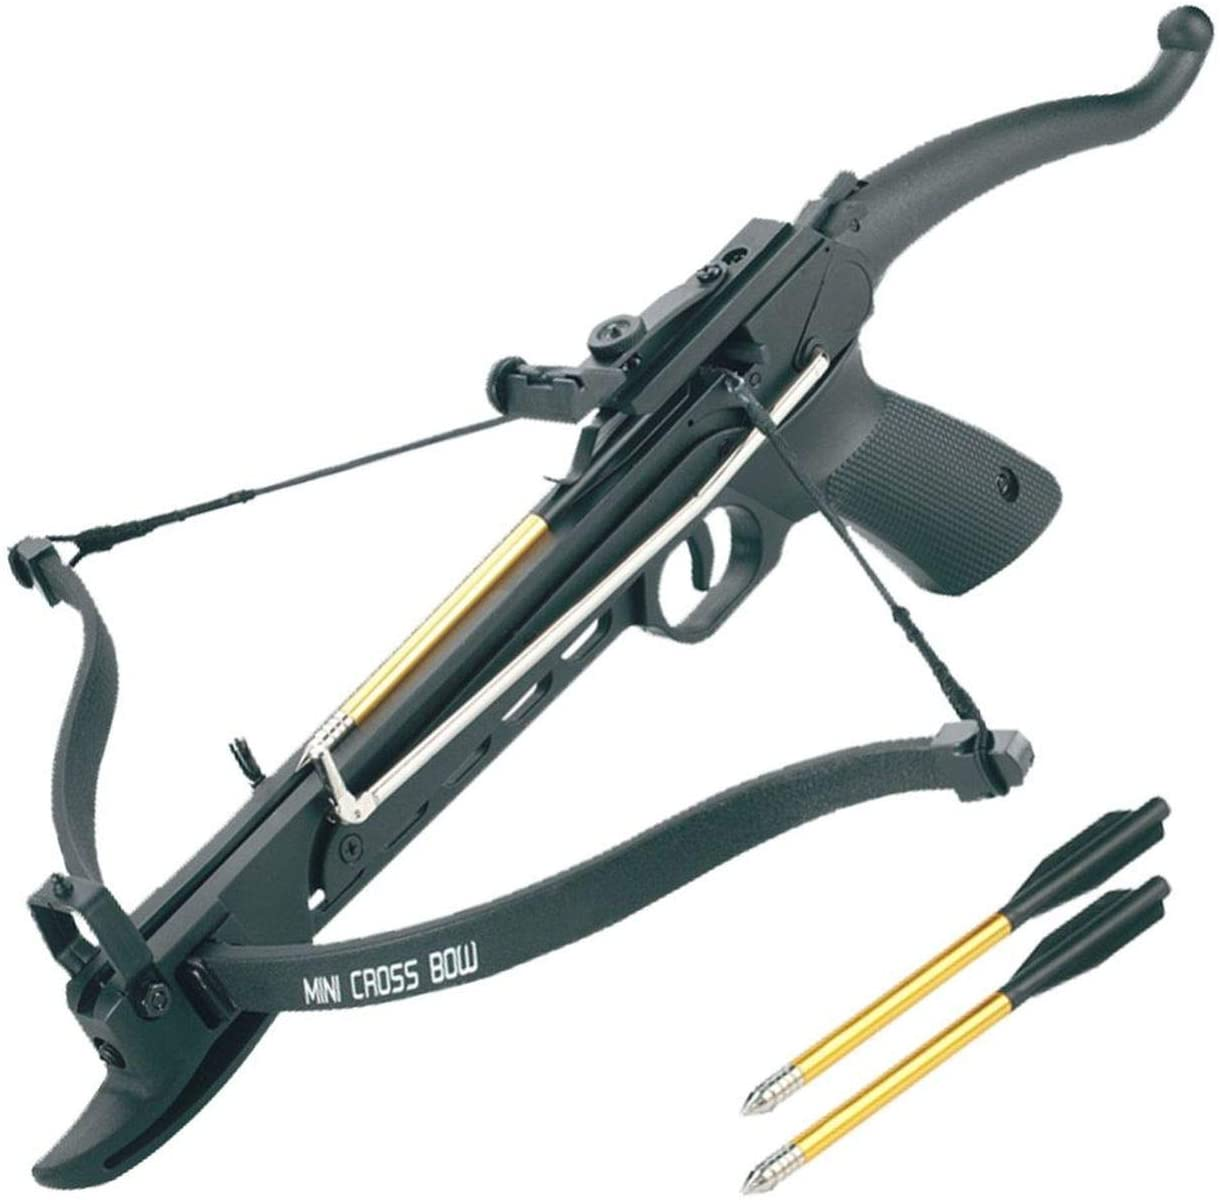 Self-Cocking Pistol Crossbow